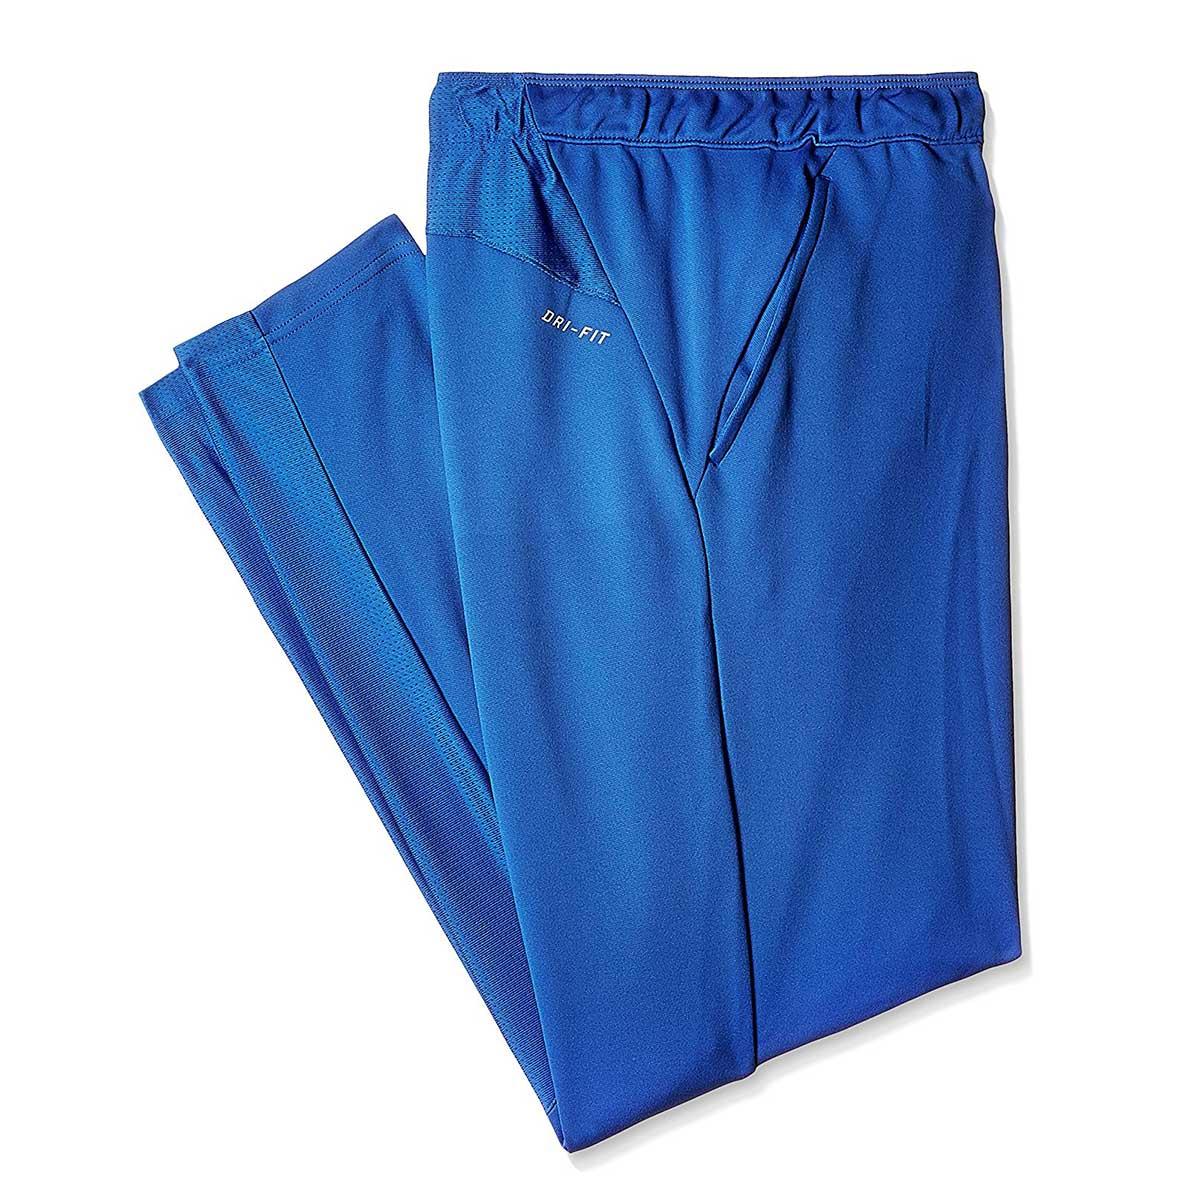 7ac1c403 Buy Nike EM TS Hitmark Cricket Trousers Online India| Nike Cricket Pants  Online Store